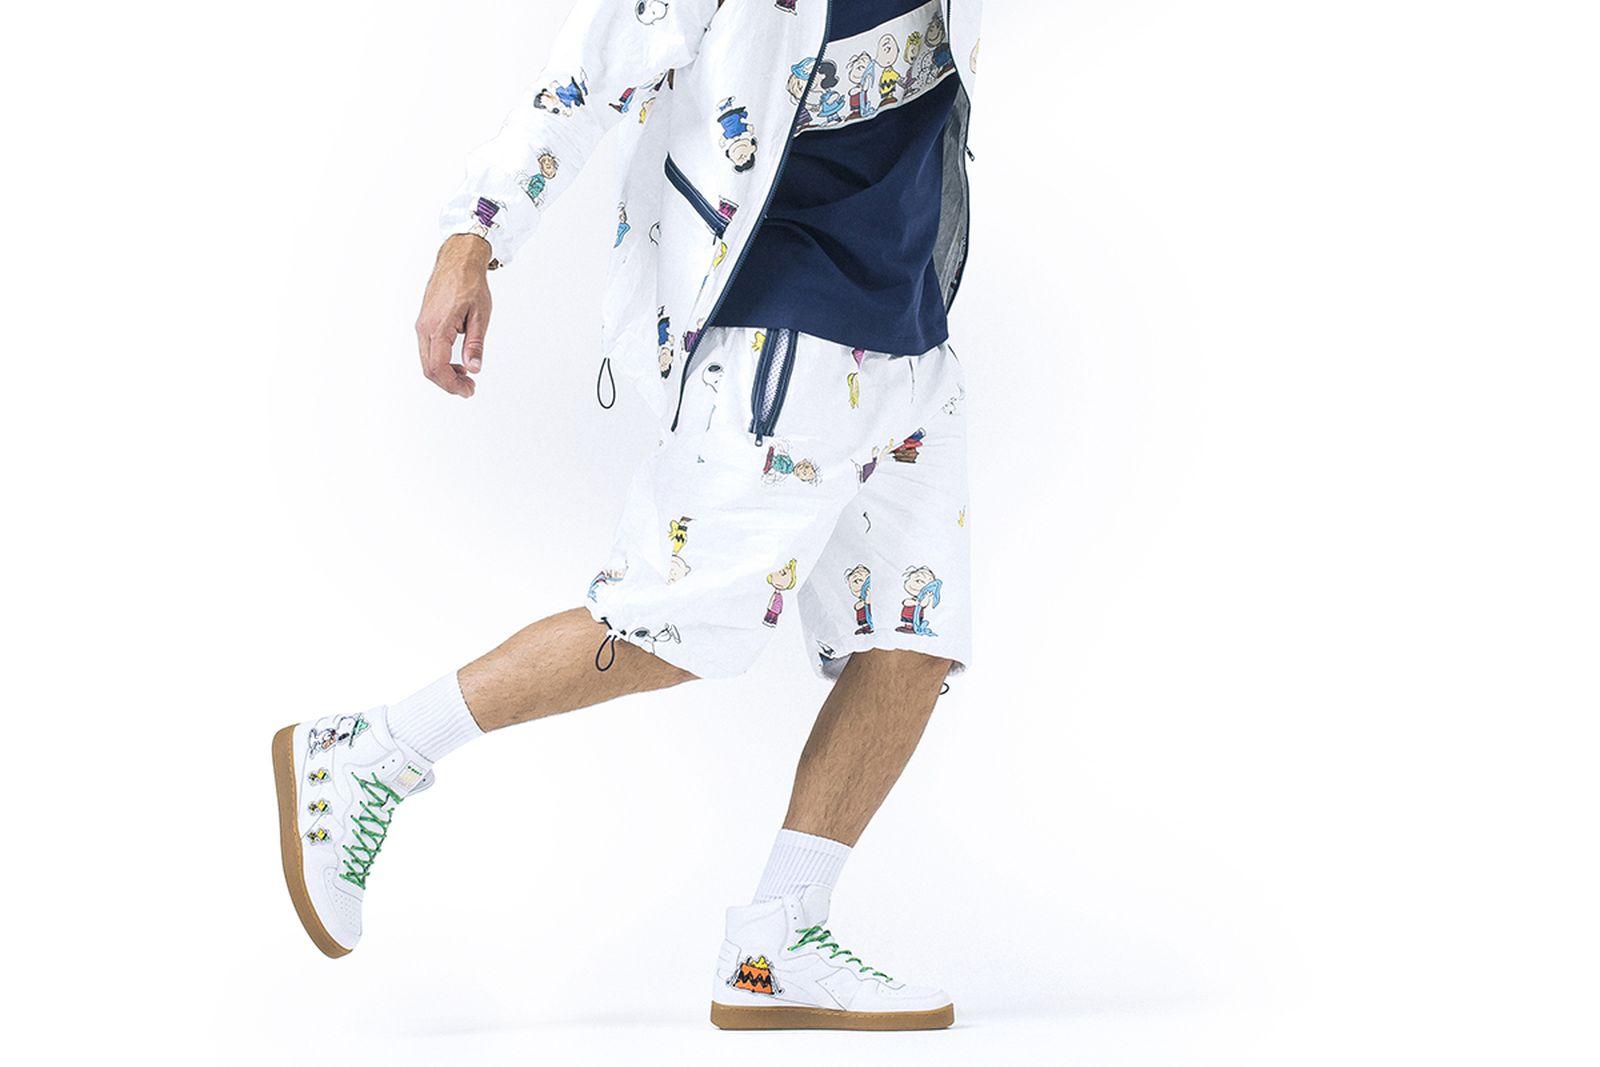 lc23 diadora peanuts sneakers release date price 1 Diadora Mi Basket diadora b elite